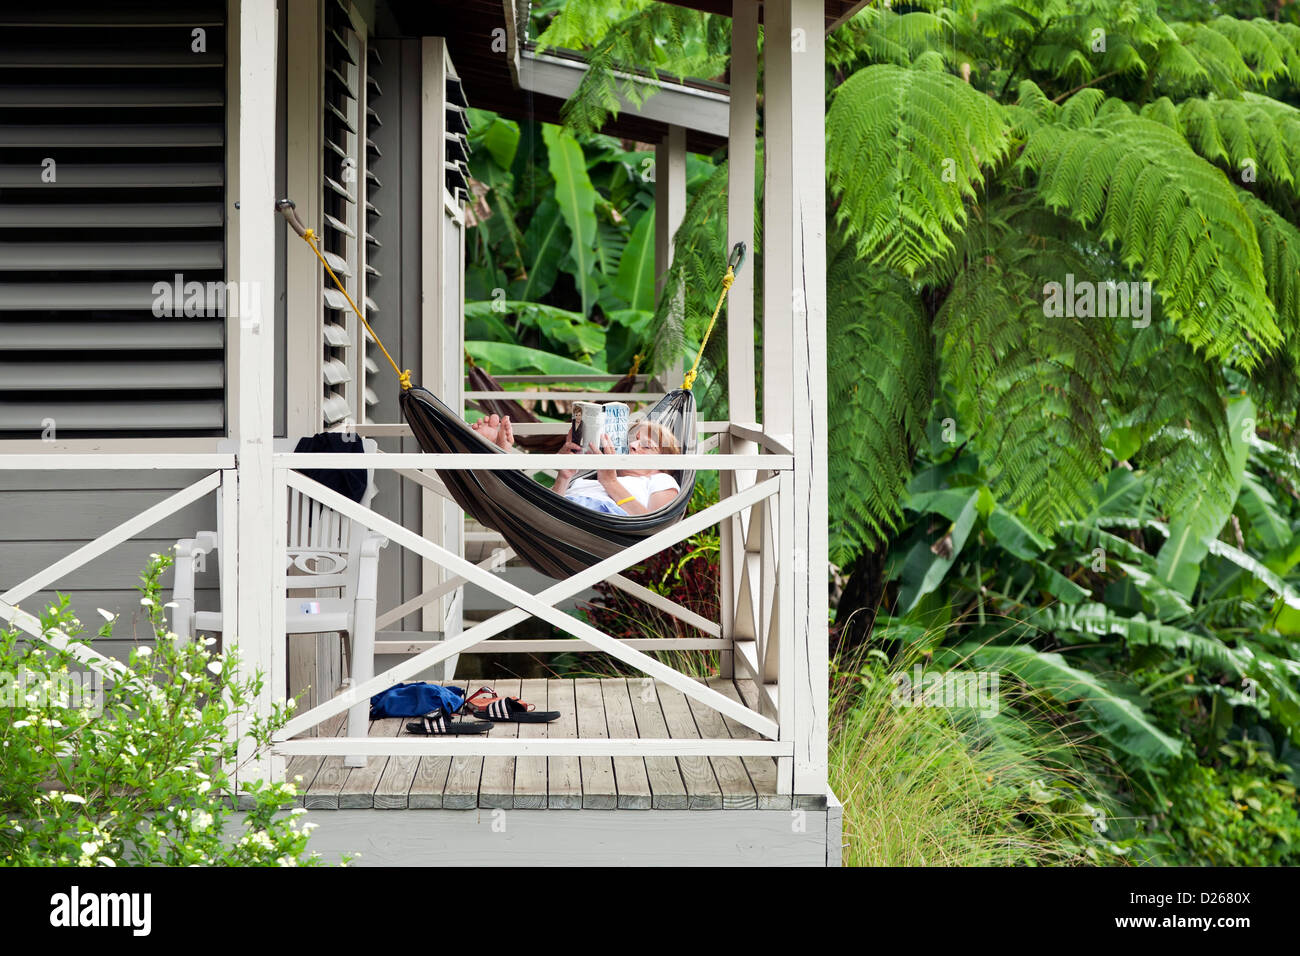 Woman reading on hammock, Casa Grande Mountain Retreat, Utuado, Puerto Rico - Stock Image